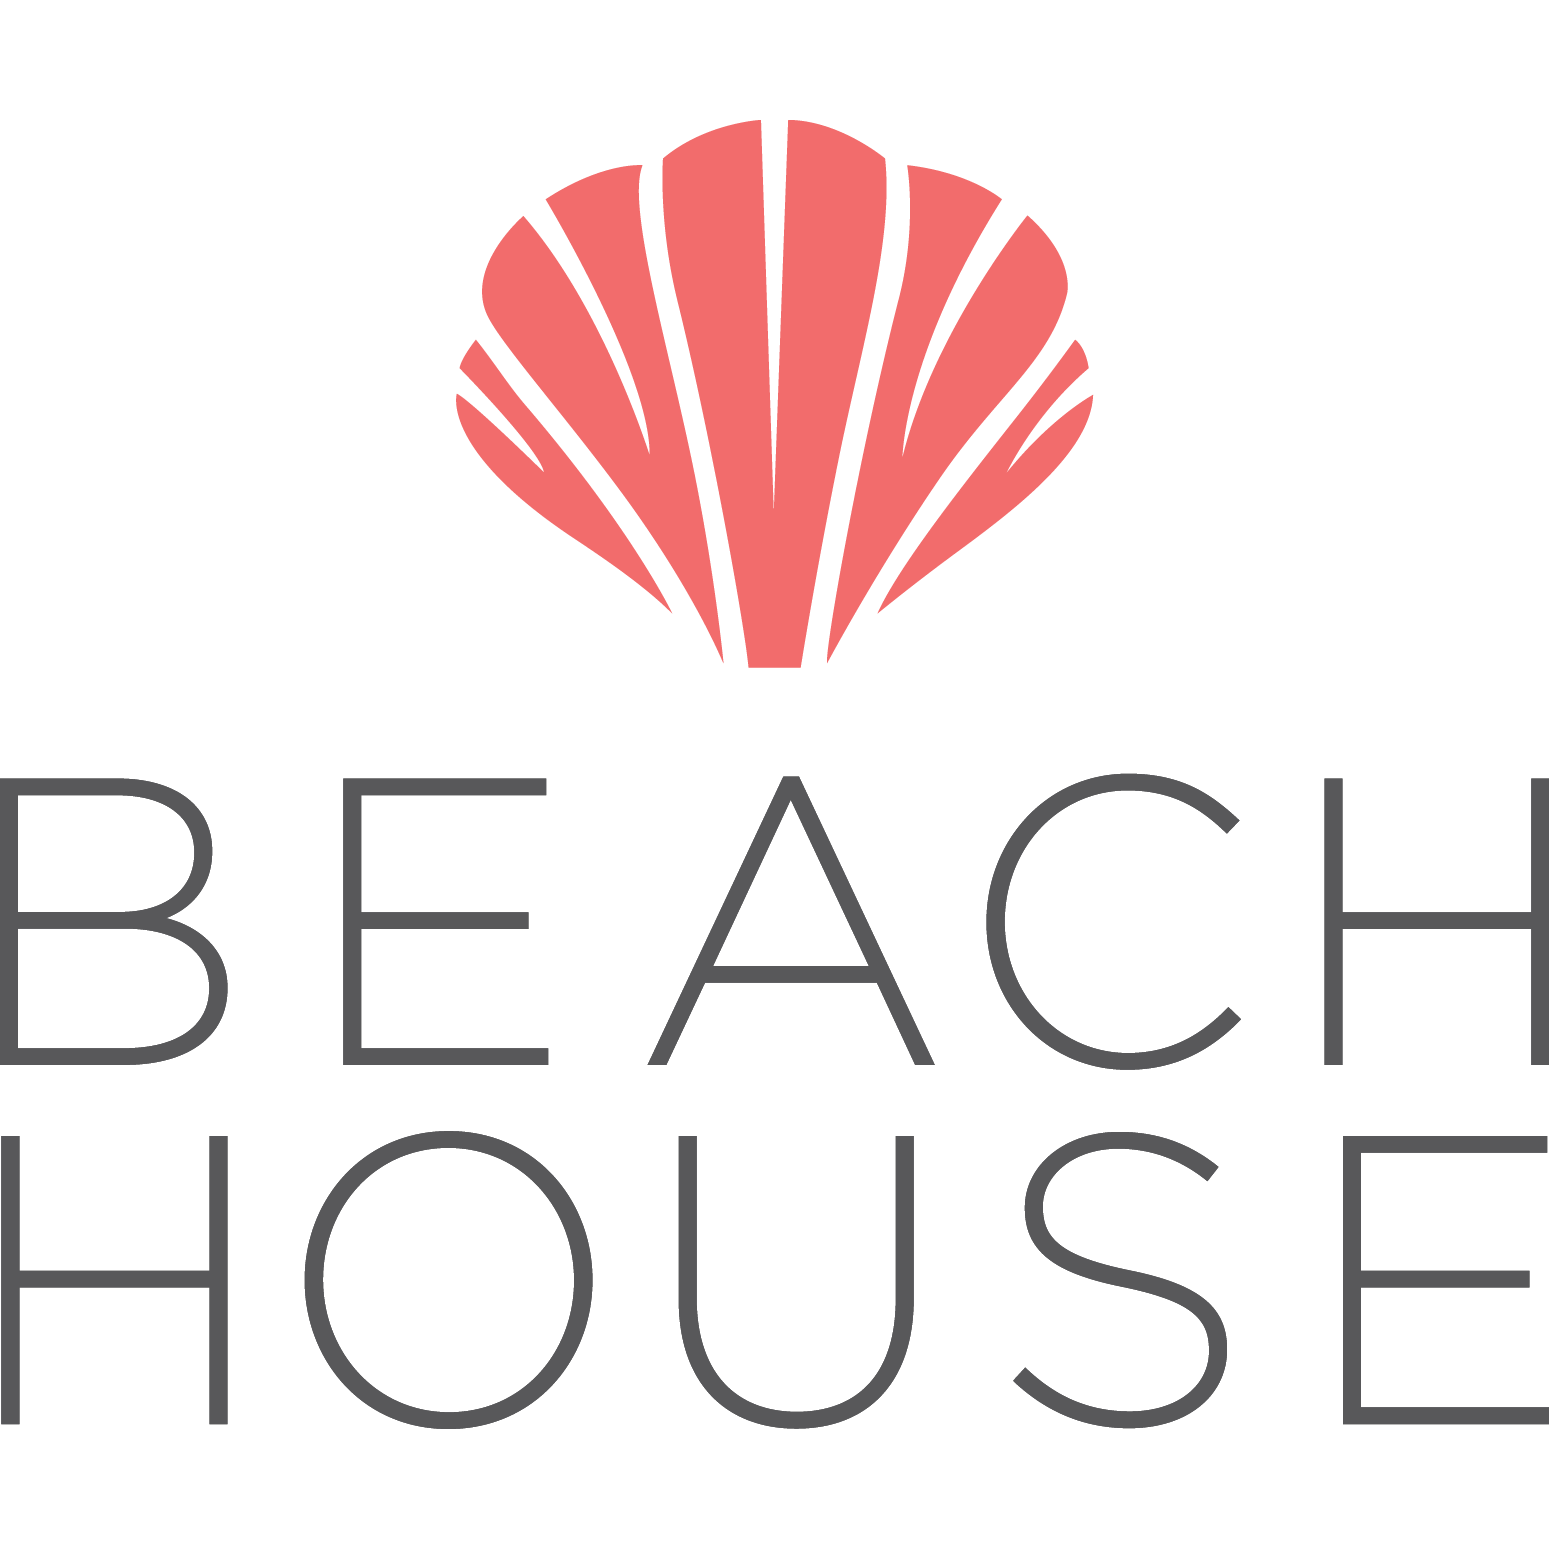 Beach House image 20